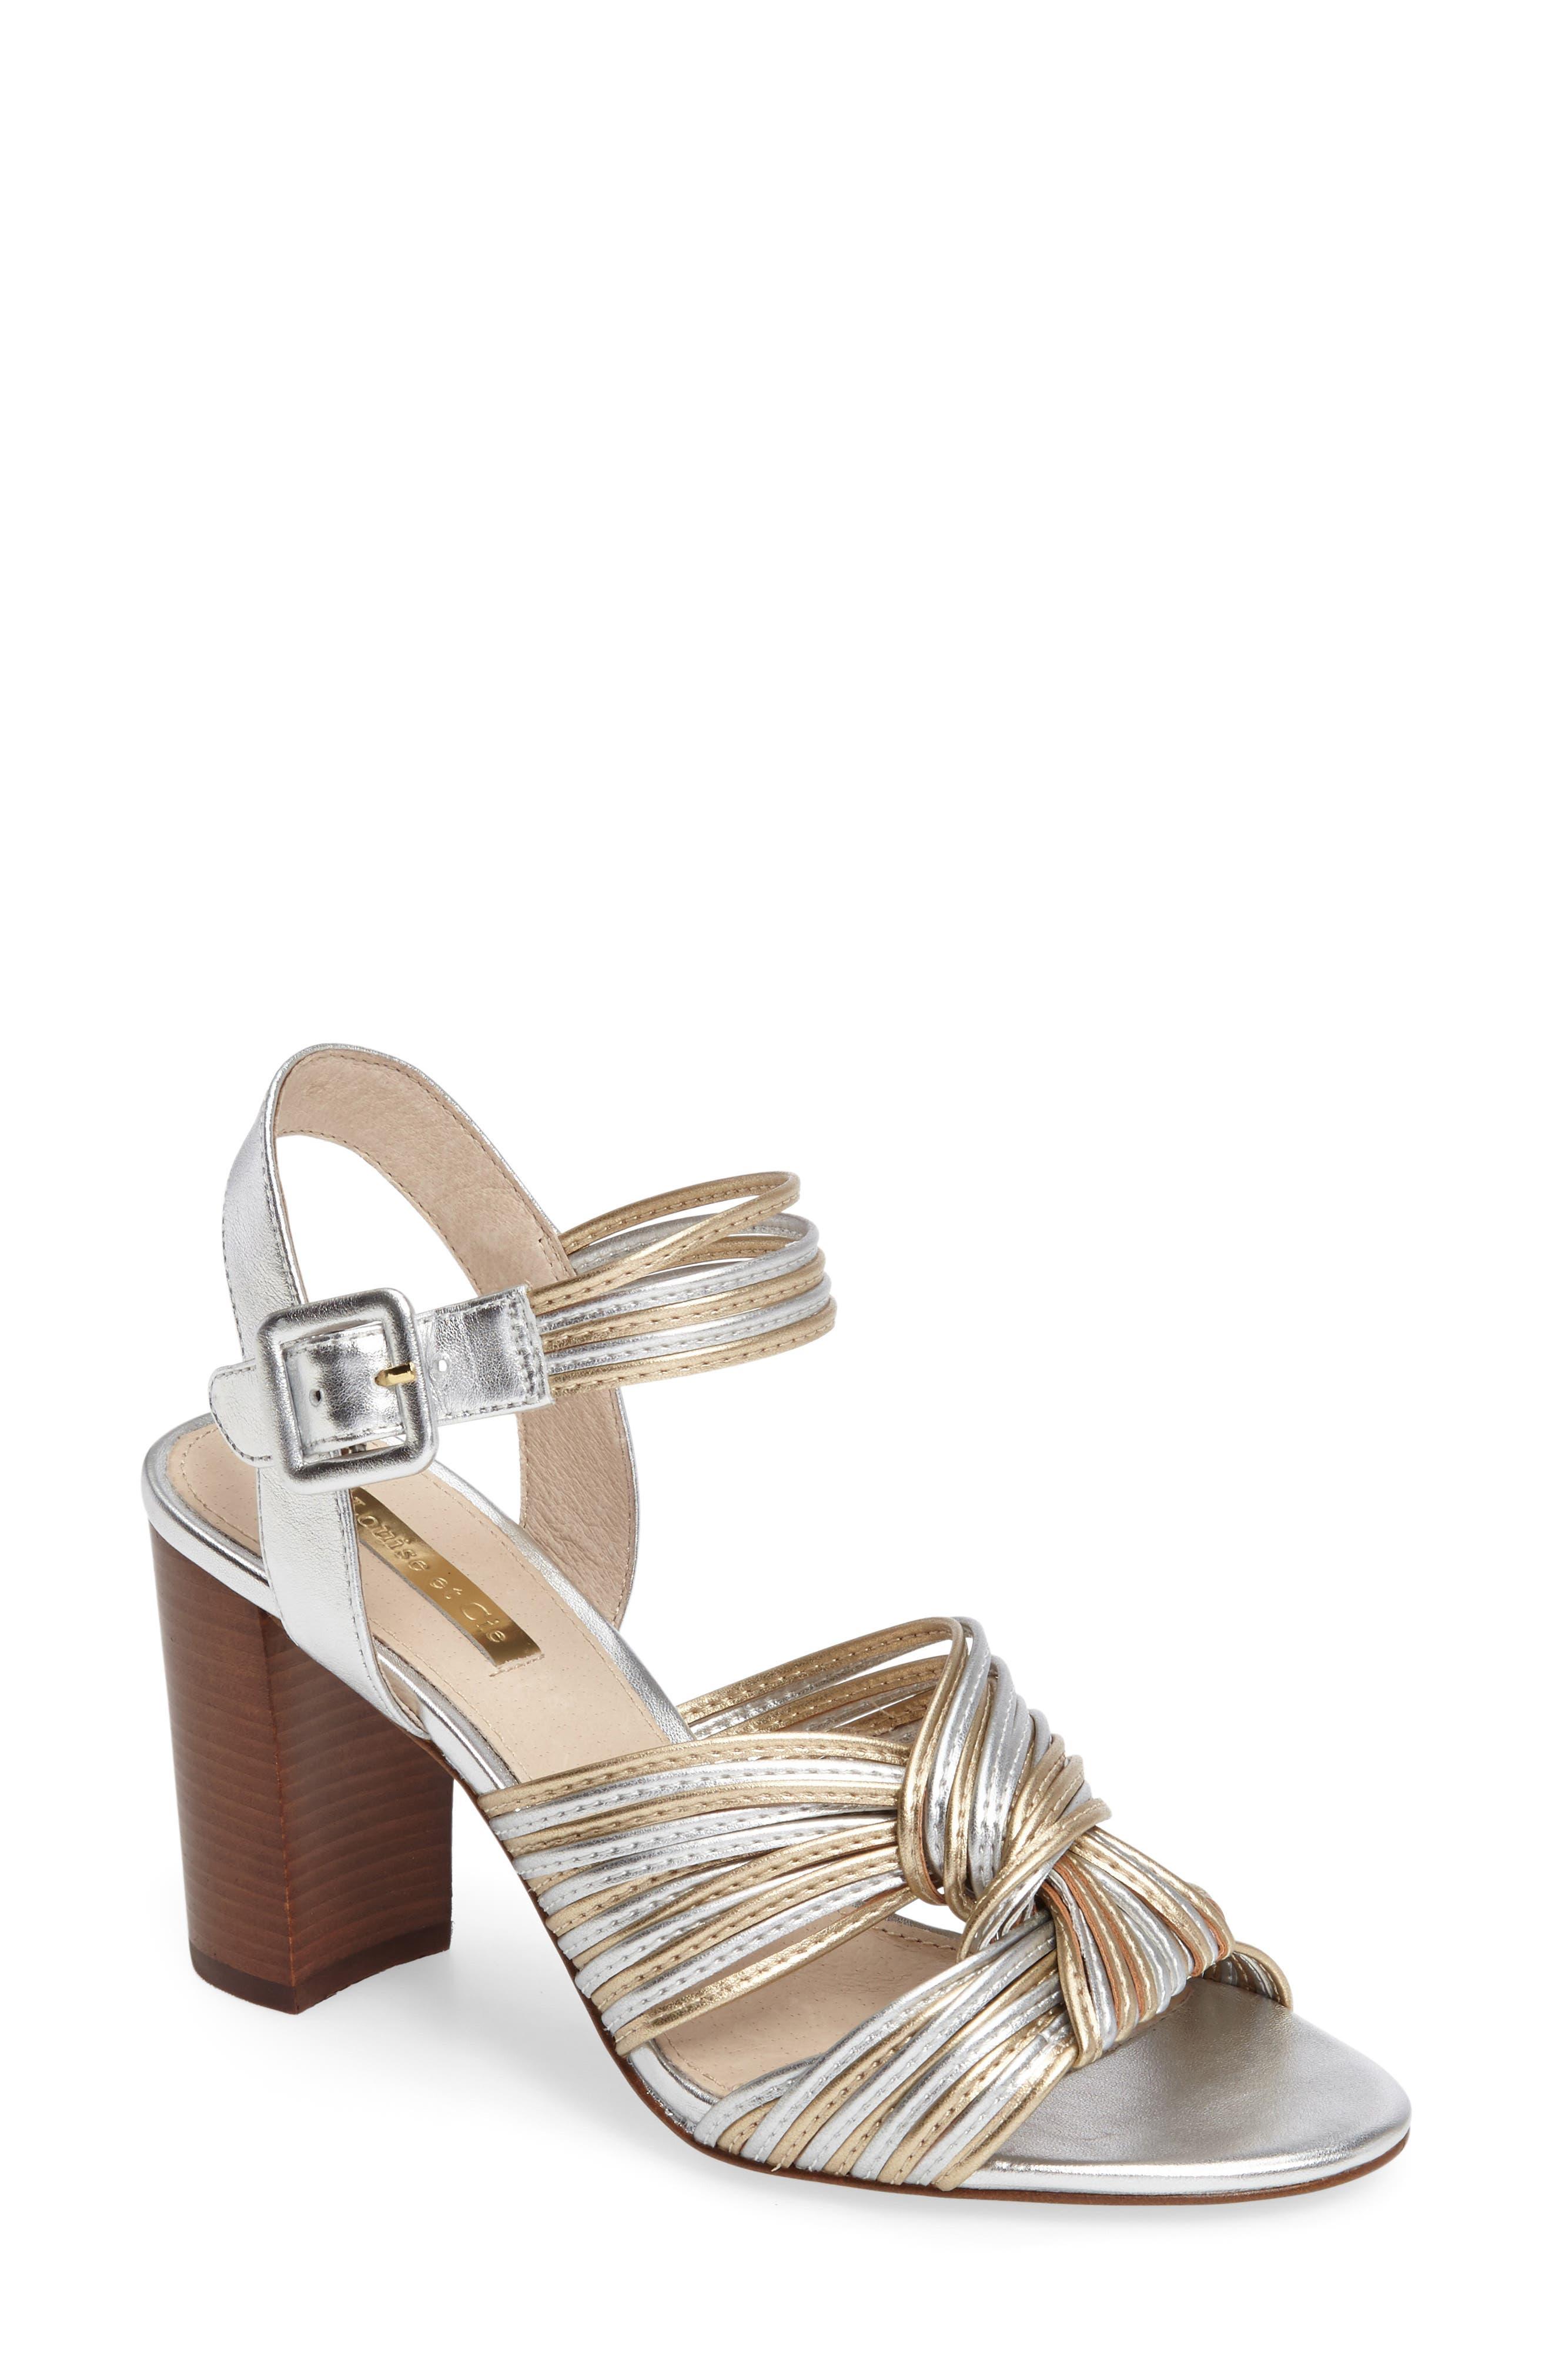 Louise et Cie Kamden Knotted Block Heel Sandal (Women)